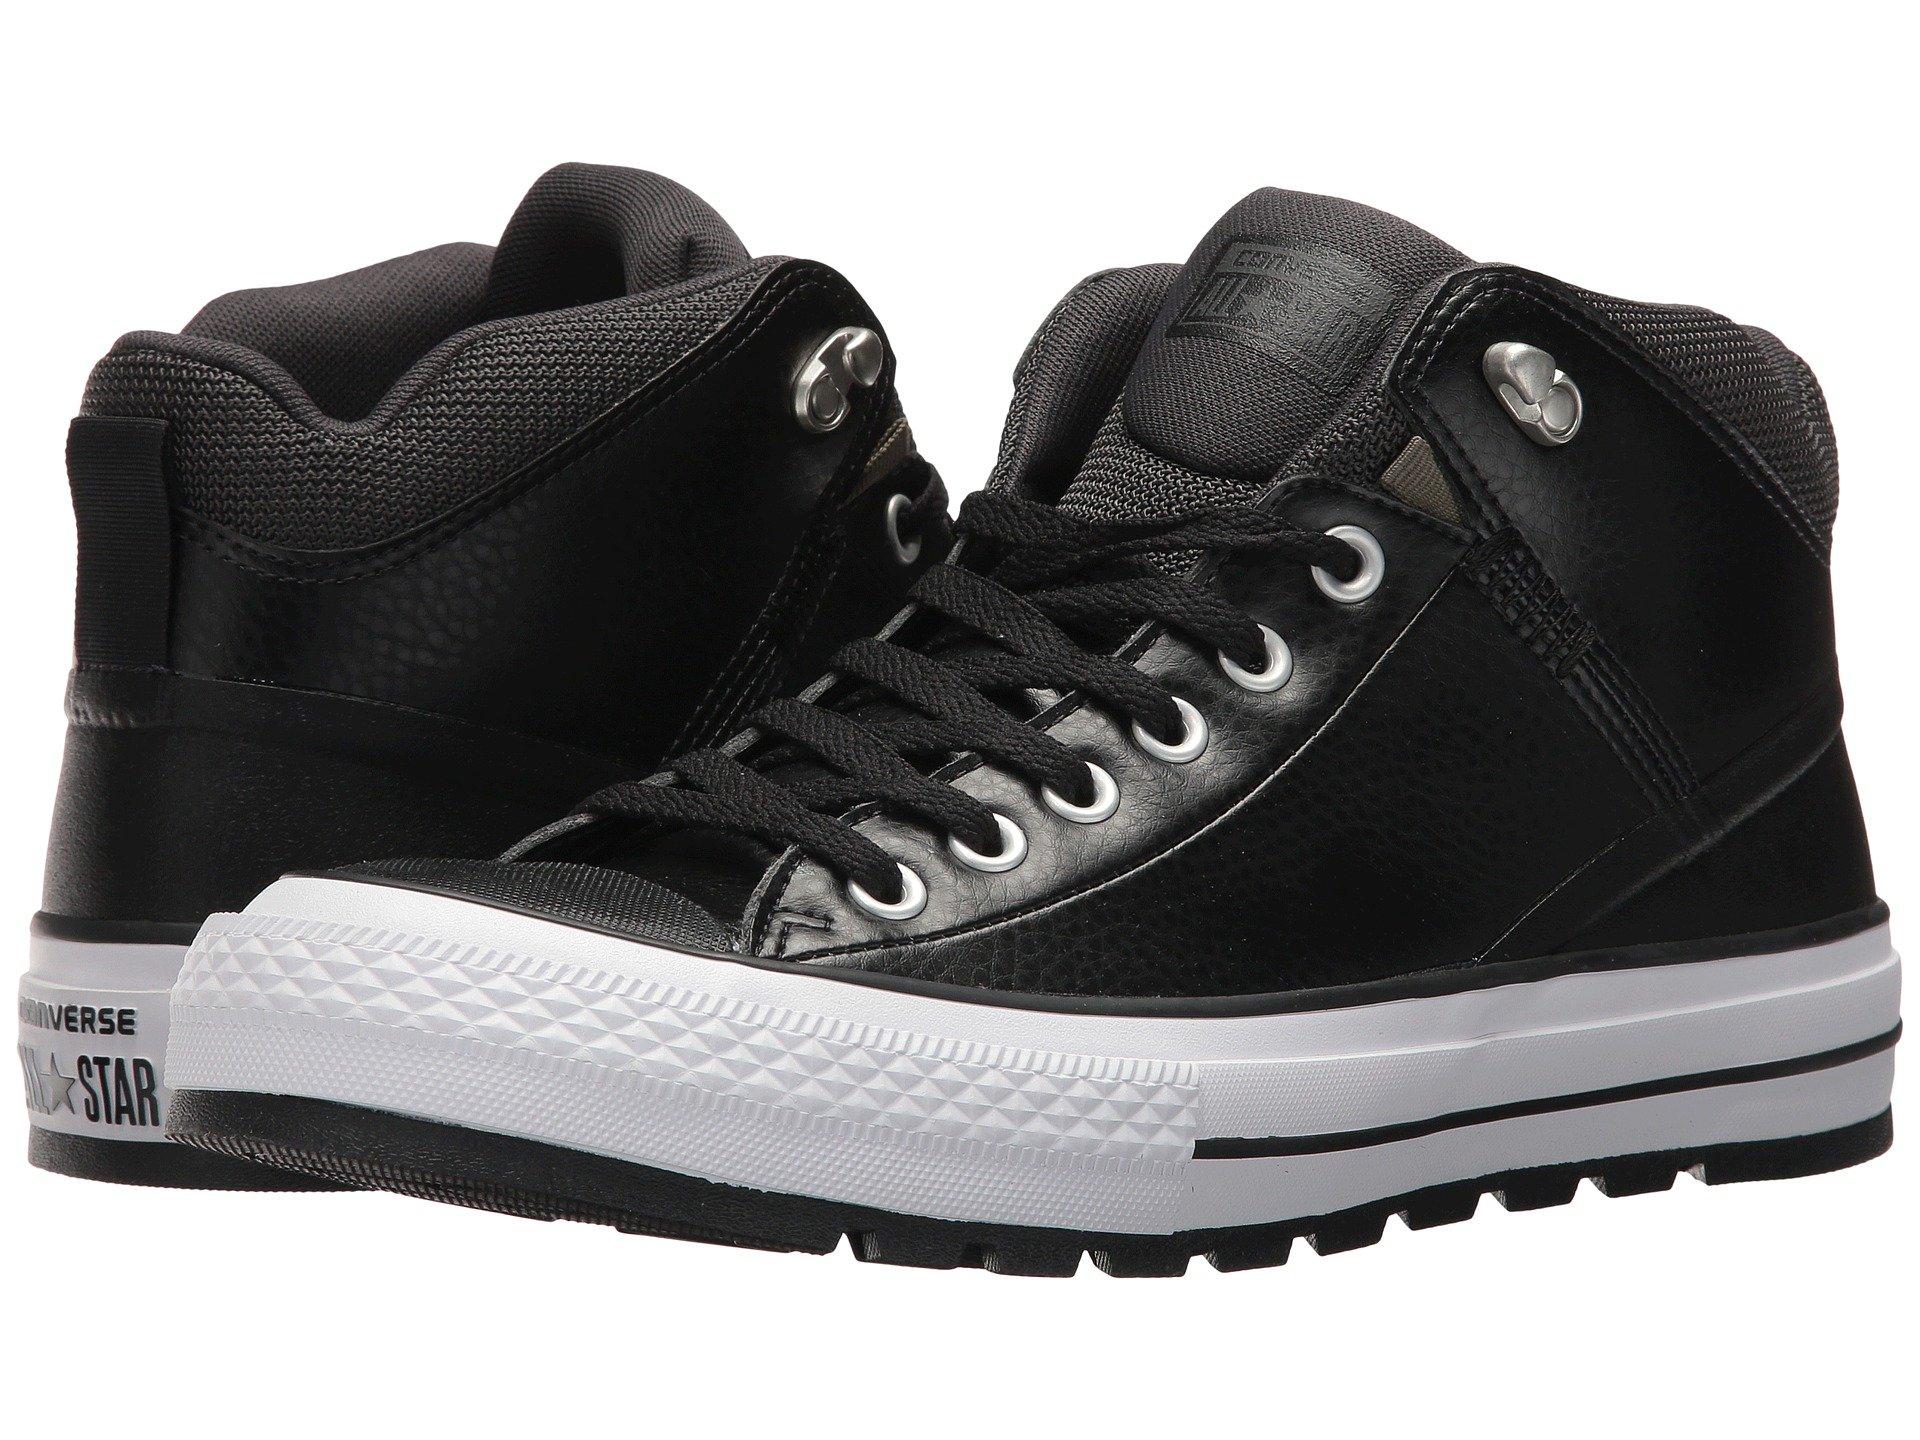 Converse Chuck Taylor All Star Street Boot HI Black